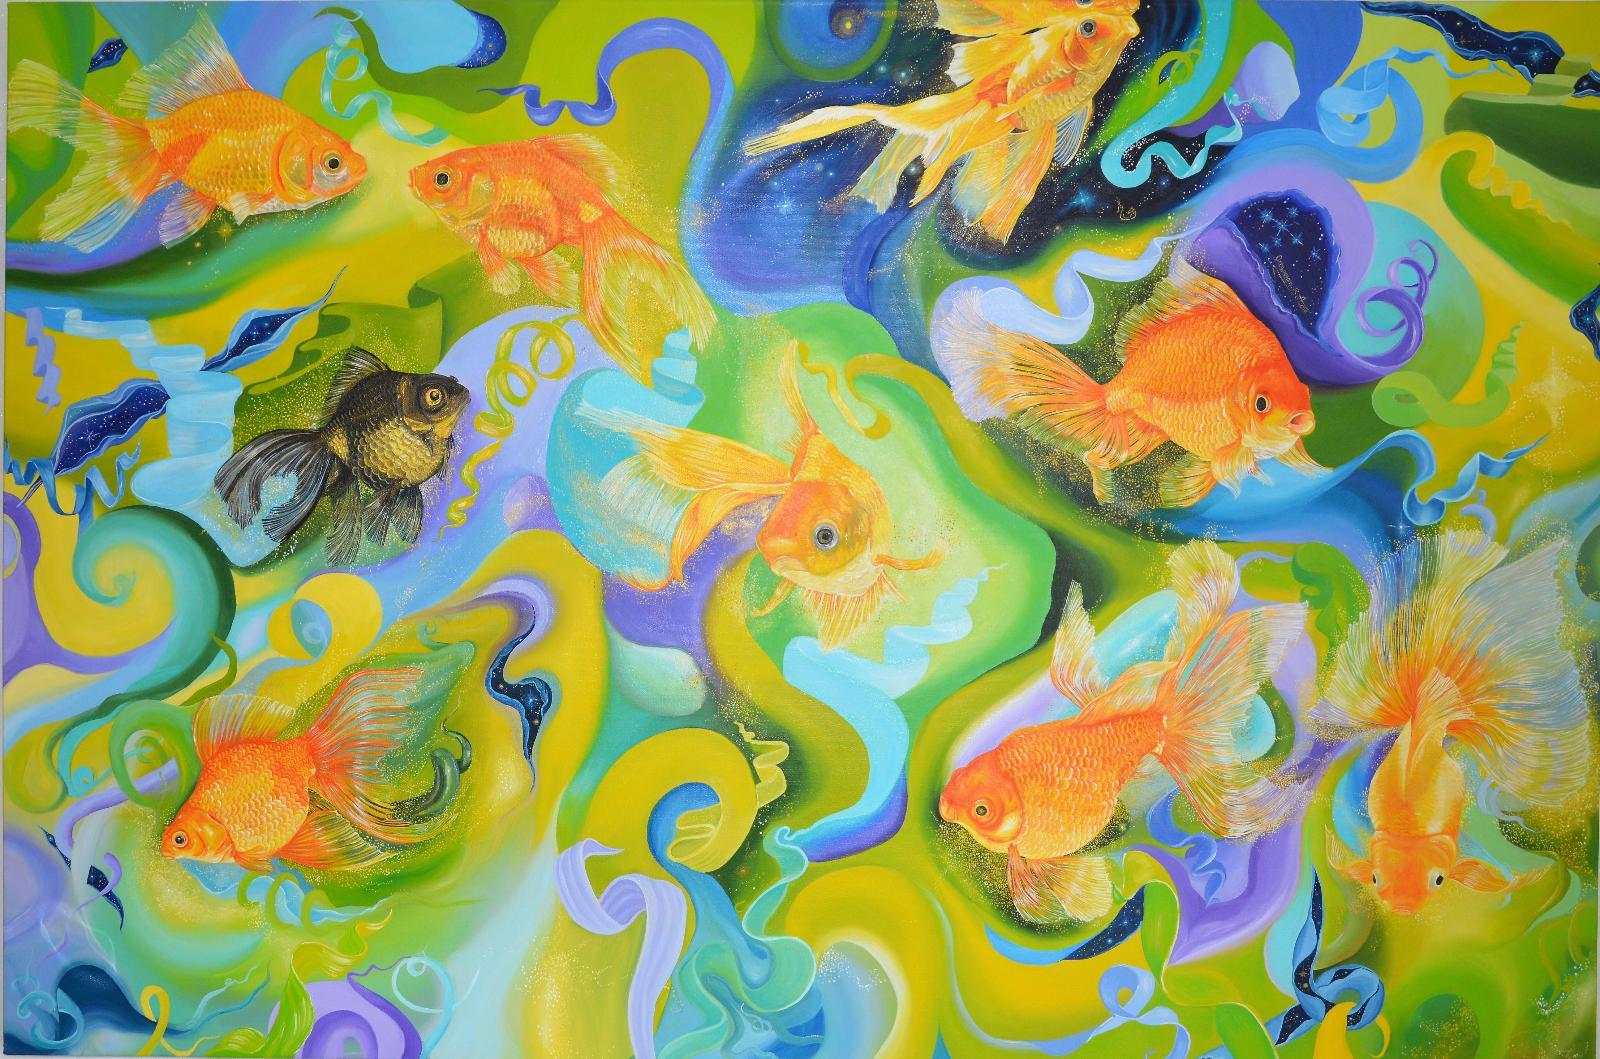 Feng Shui искусство живопись чертежи фото галерея